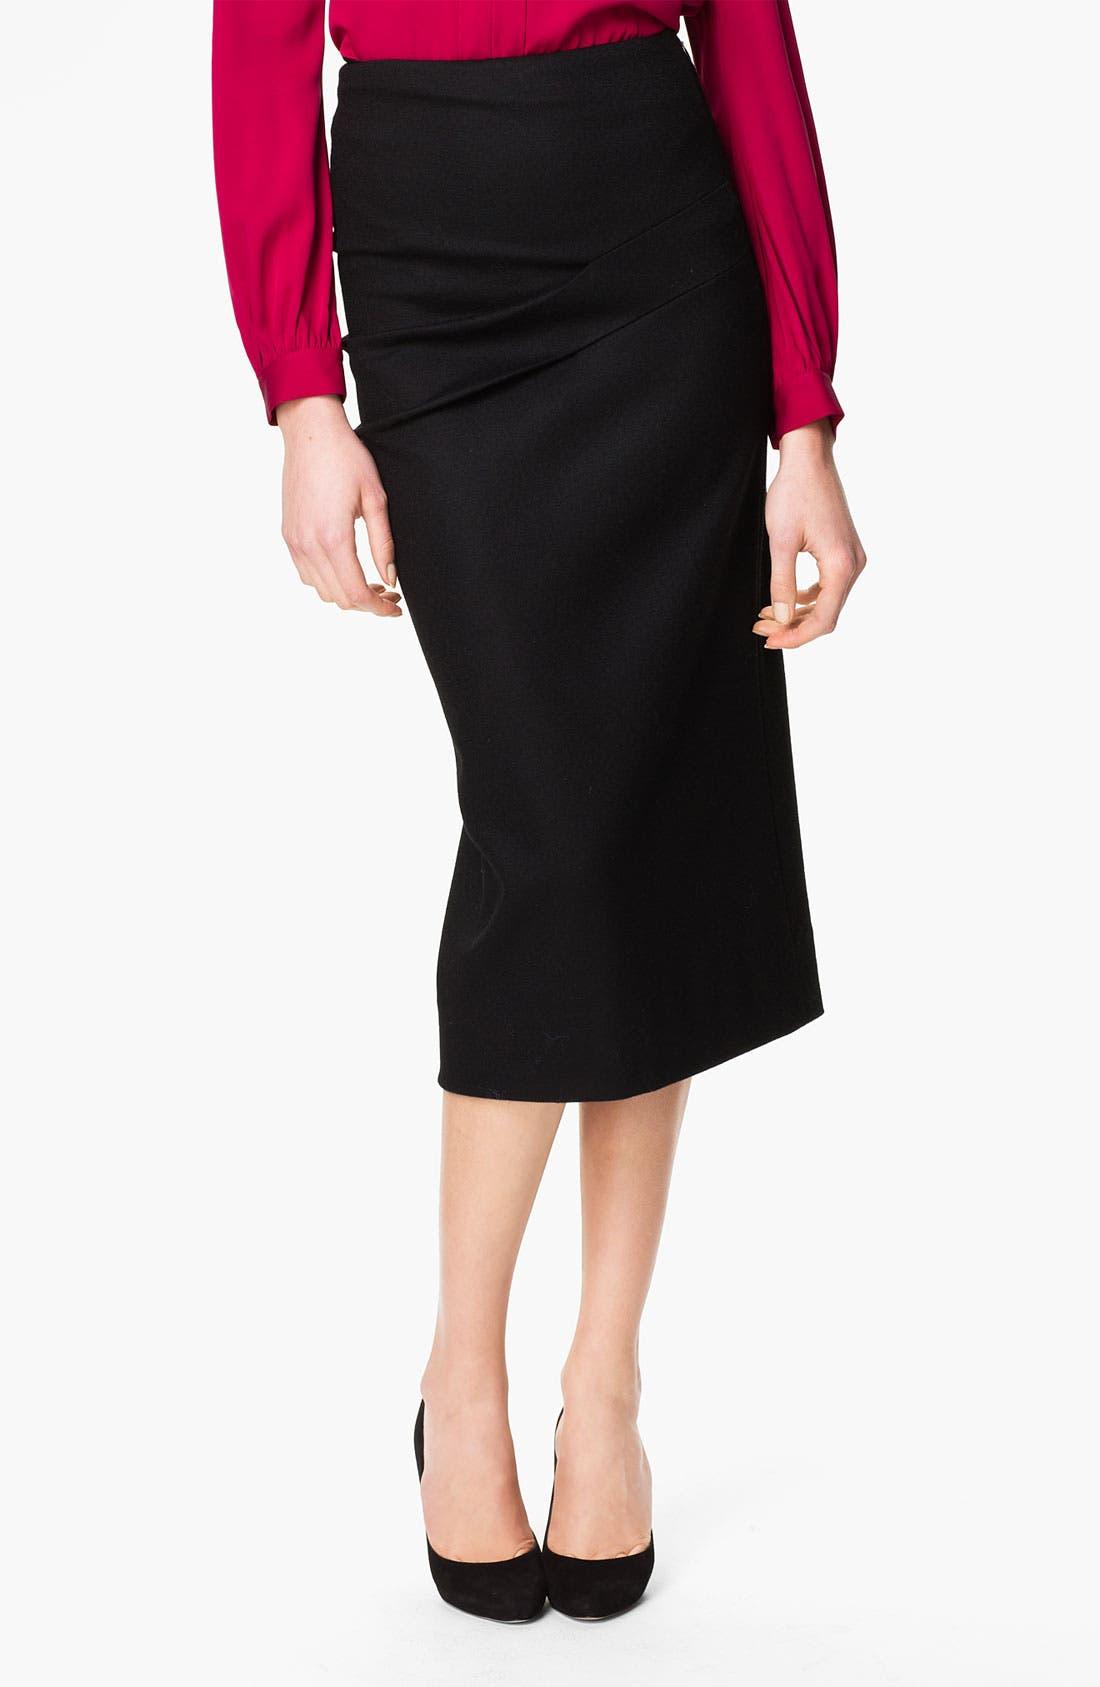 Alternate Image 1 Selected - Diane von Furstenberg 'Maribela' Skirt